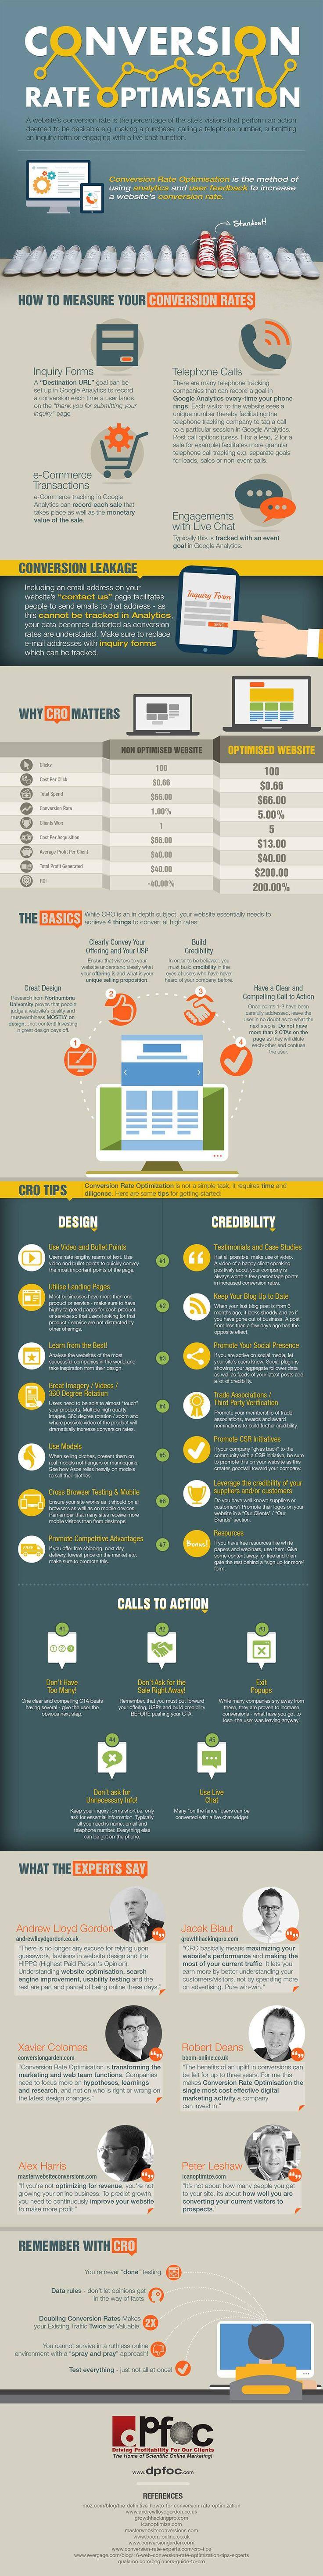 Conversion Rate Optimisation #infographic #Marketing #DigitalMarketing